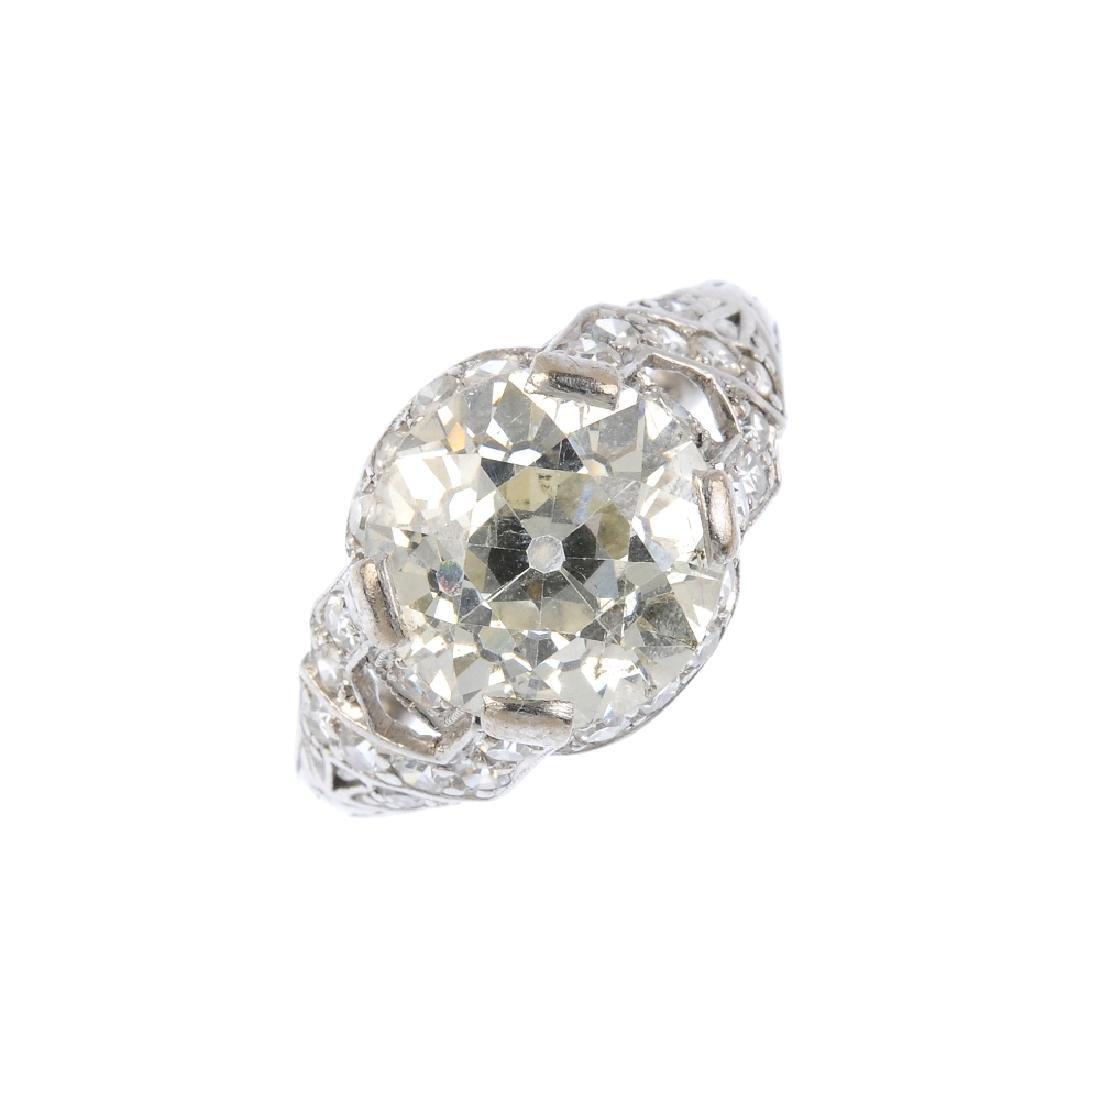 An Art Deco platinum diamond single-stone ring. The